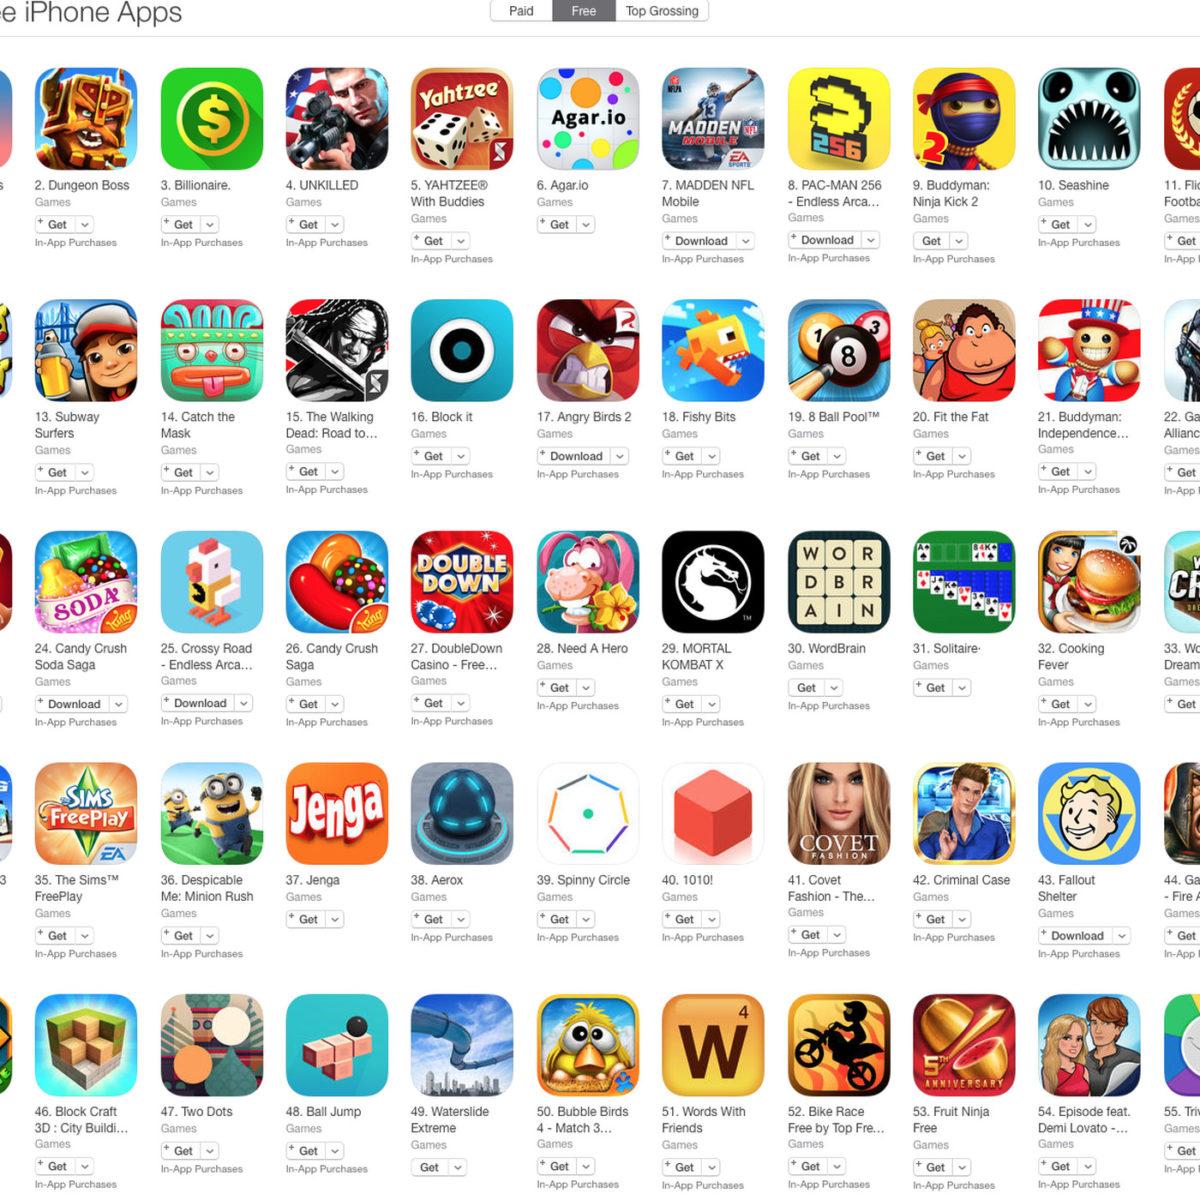 App Store 提供海量 app ,為文化產業提供良好競爭平台。